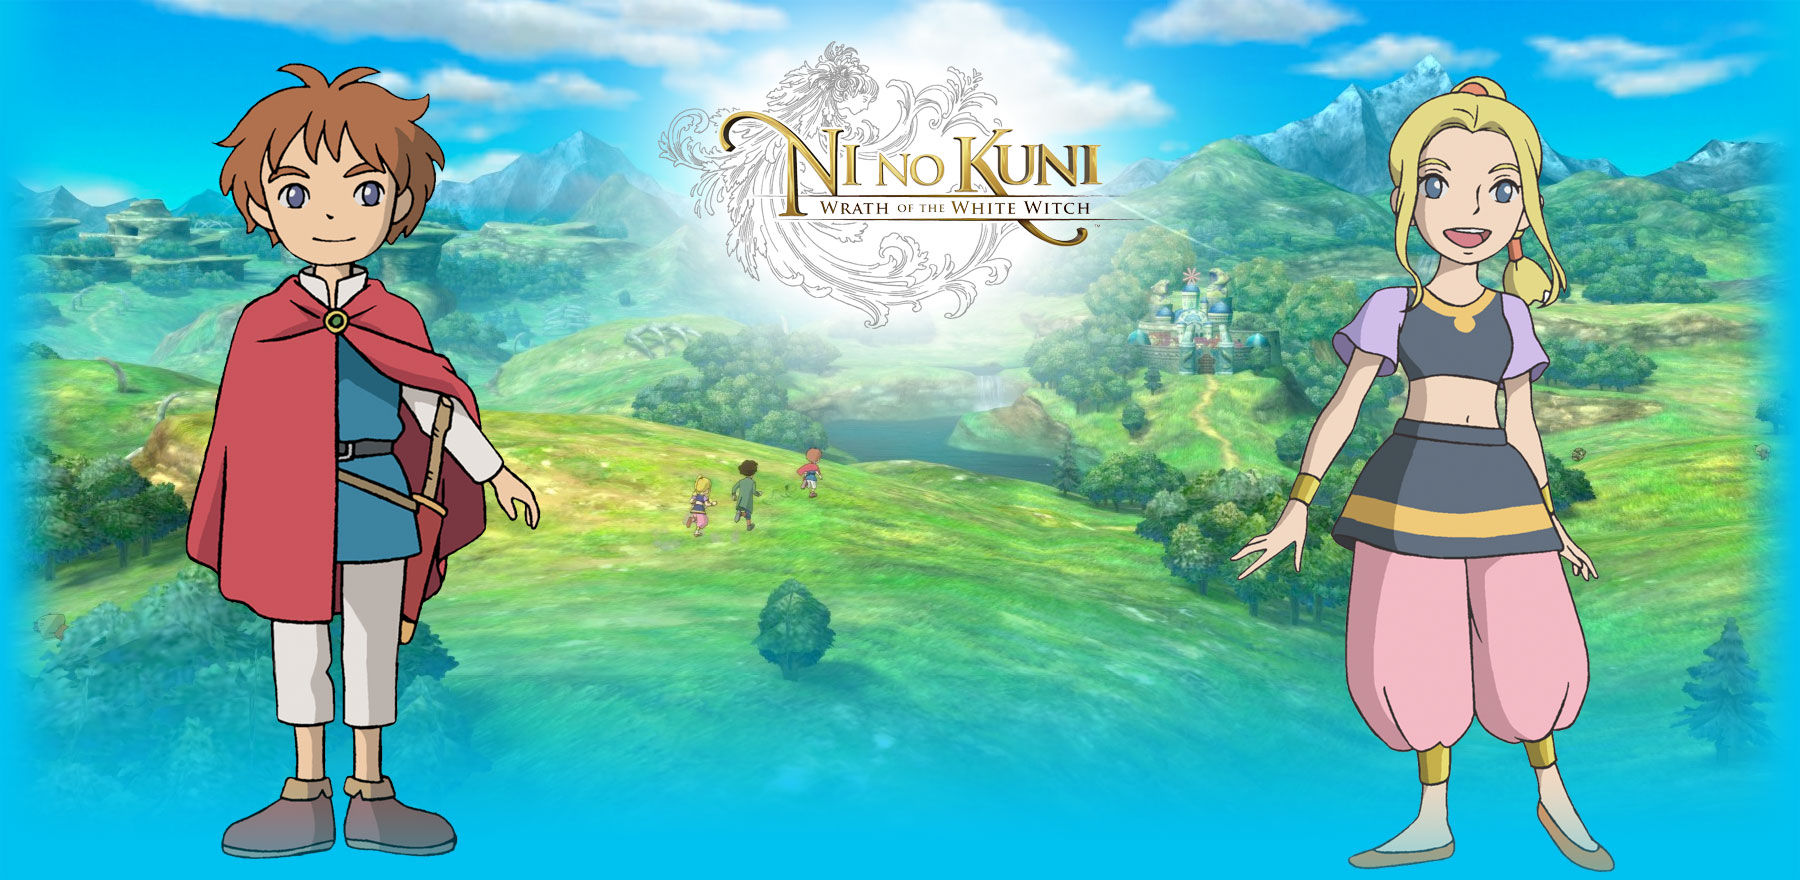 Ni No Kuni Ps3 Games Wallpapers Best Hd Wallpapers